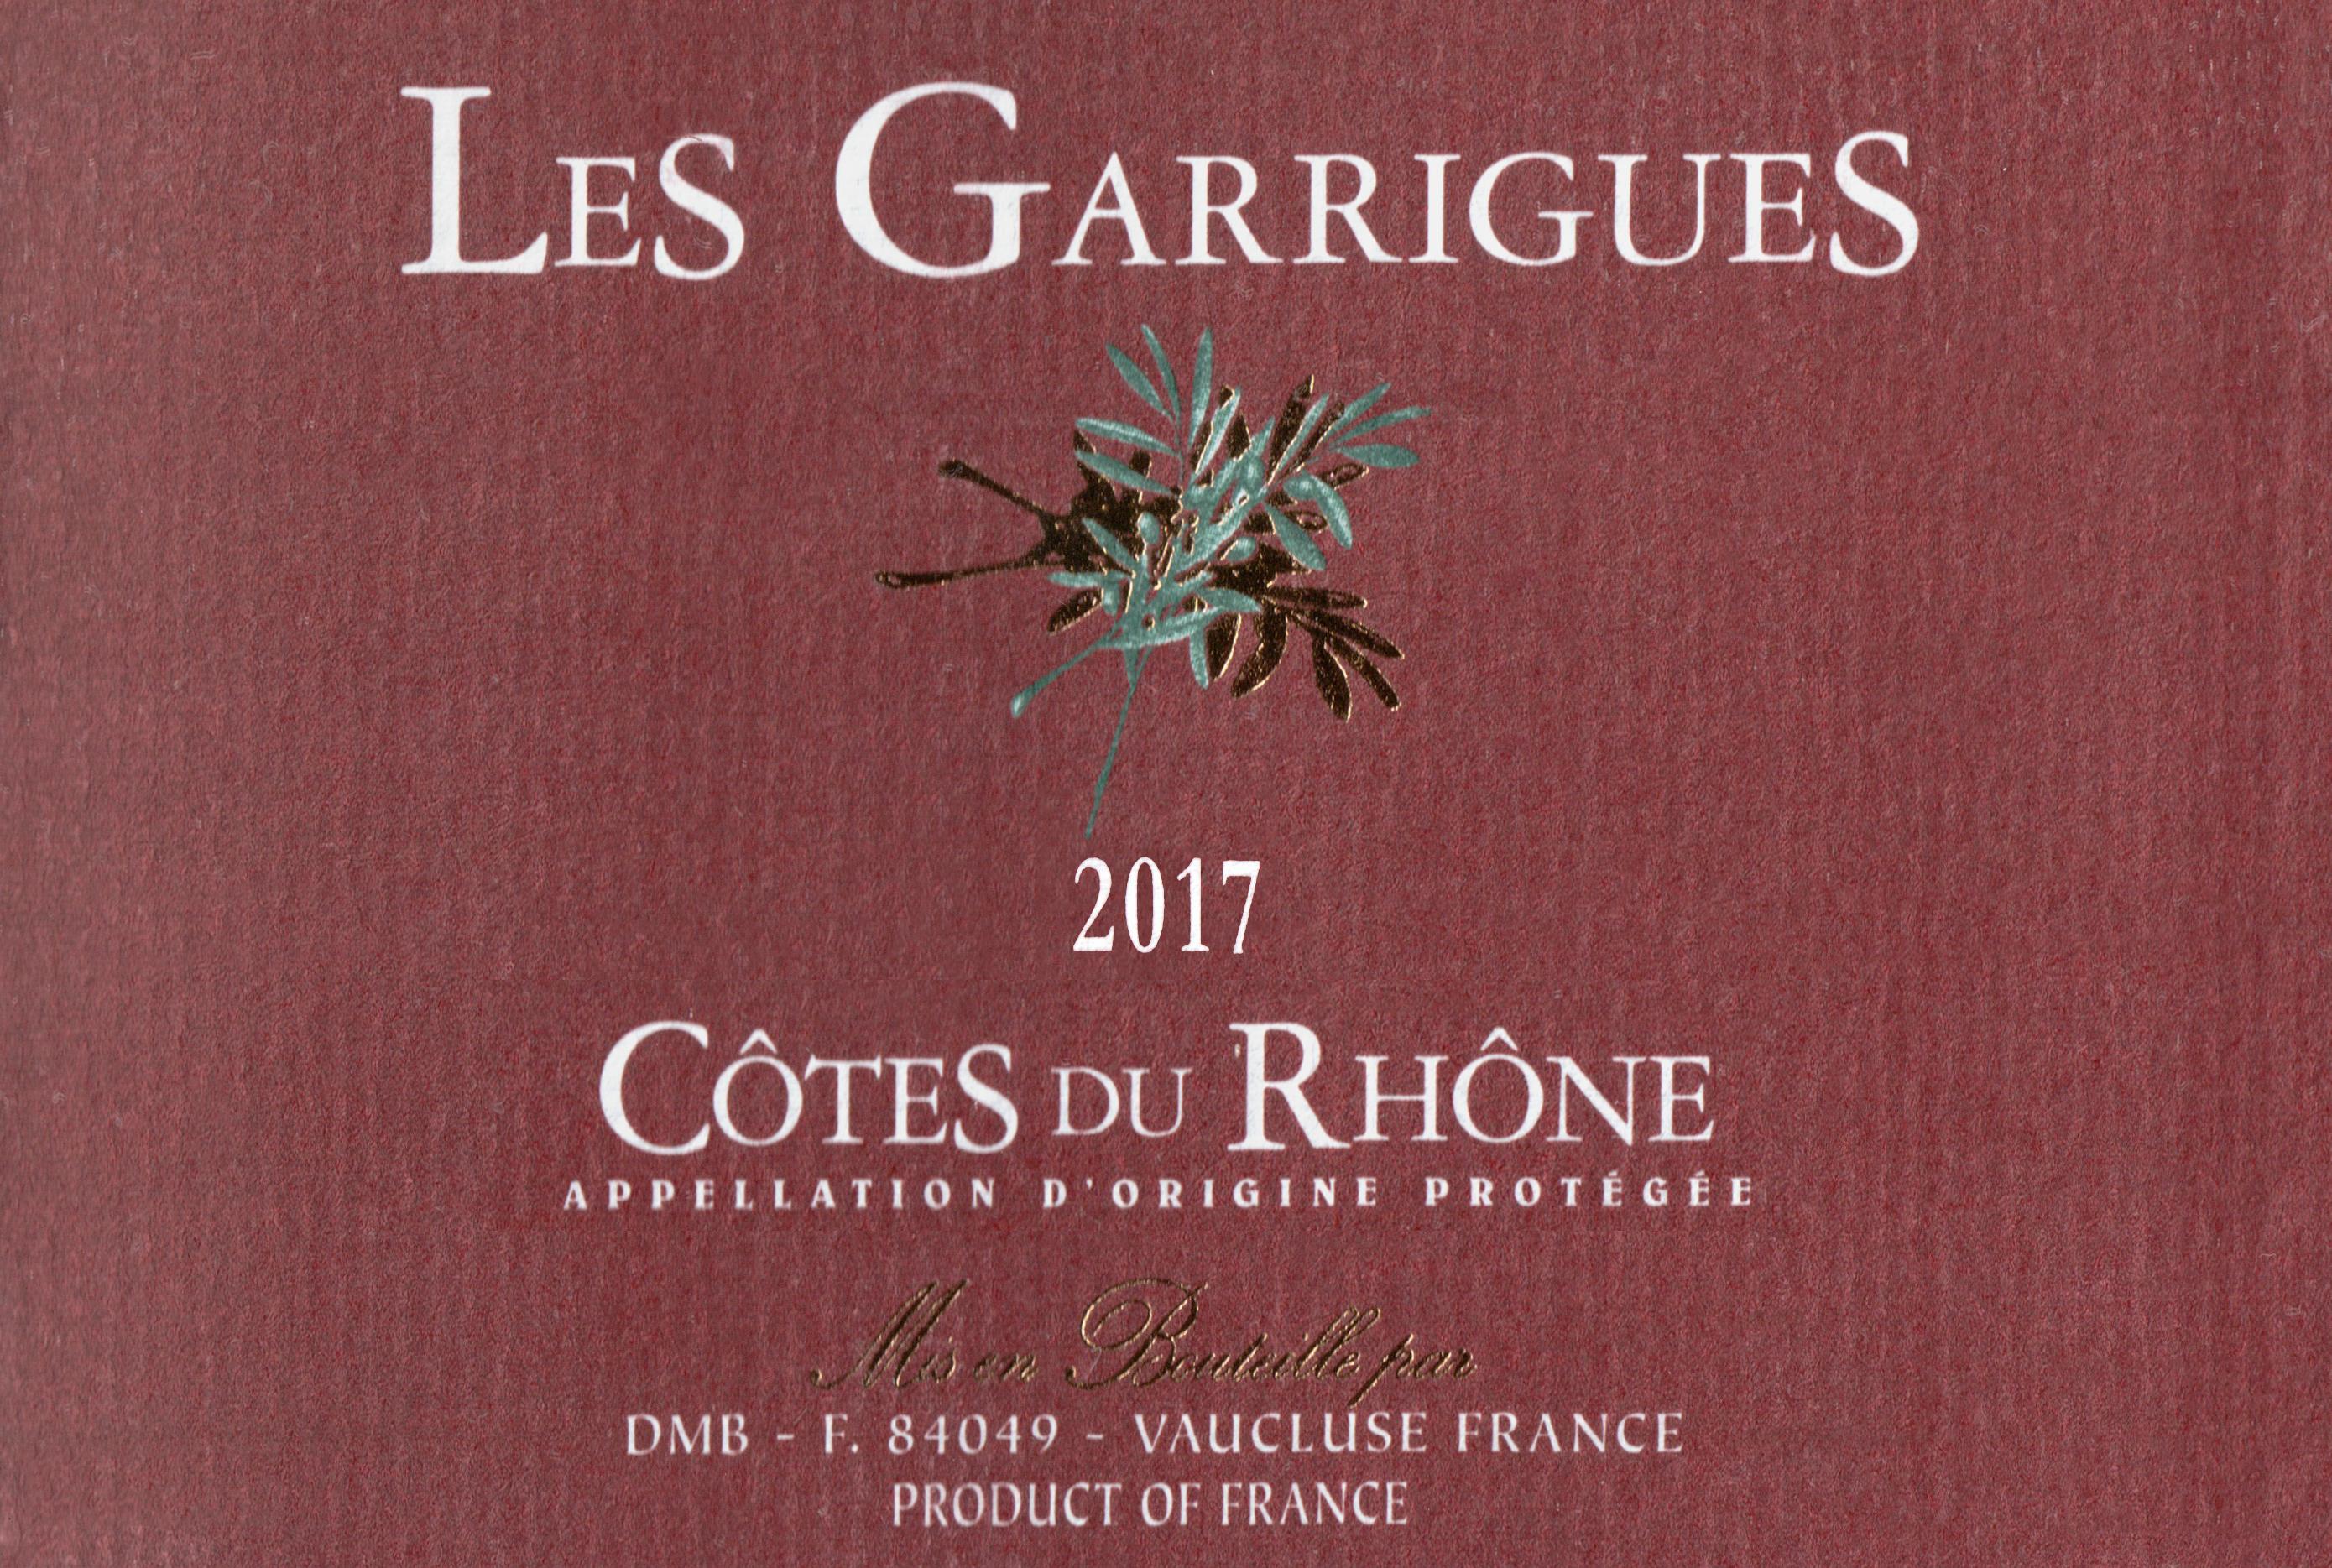 Les Garrigues Cotes Du Rhone 2017